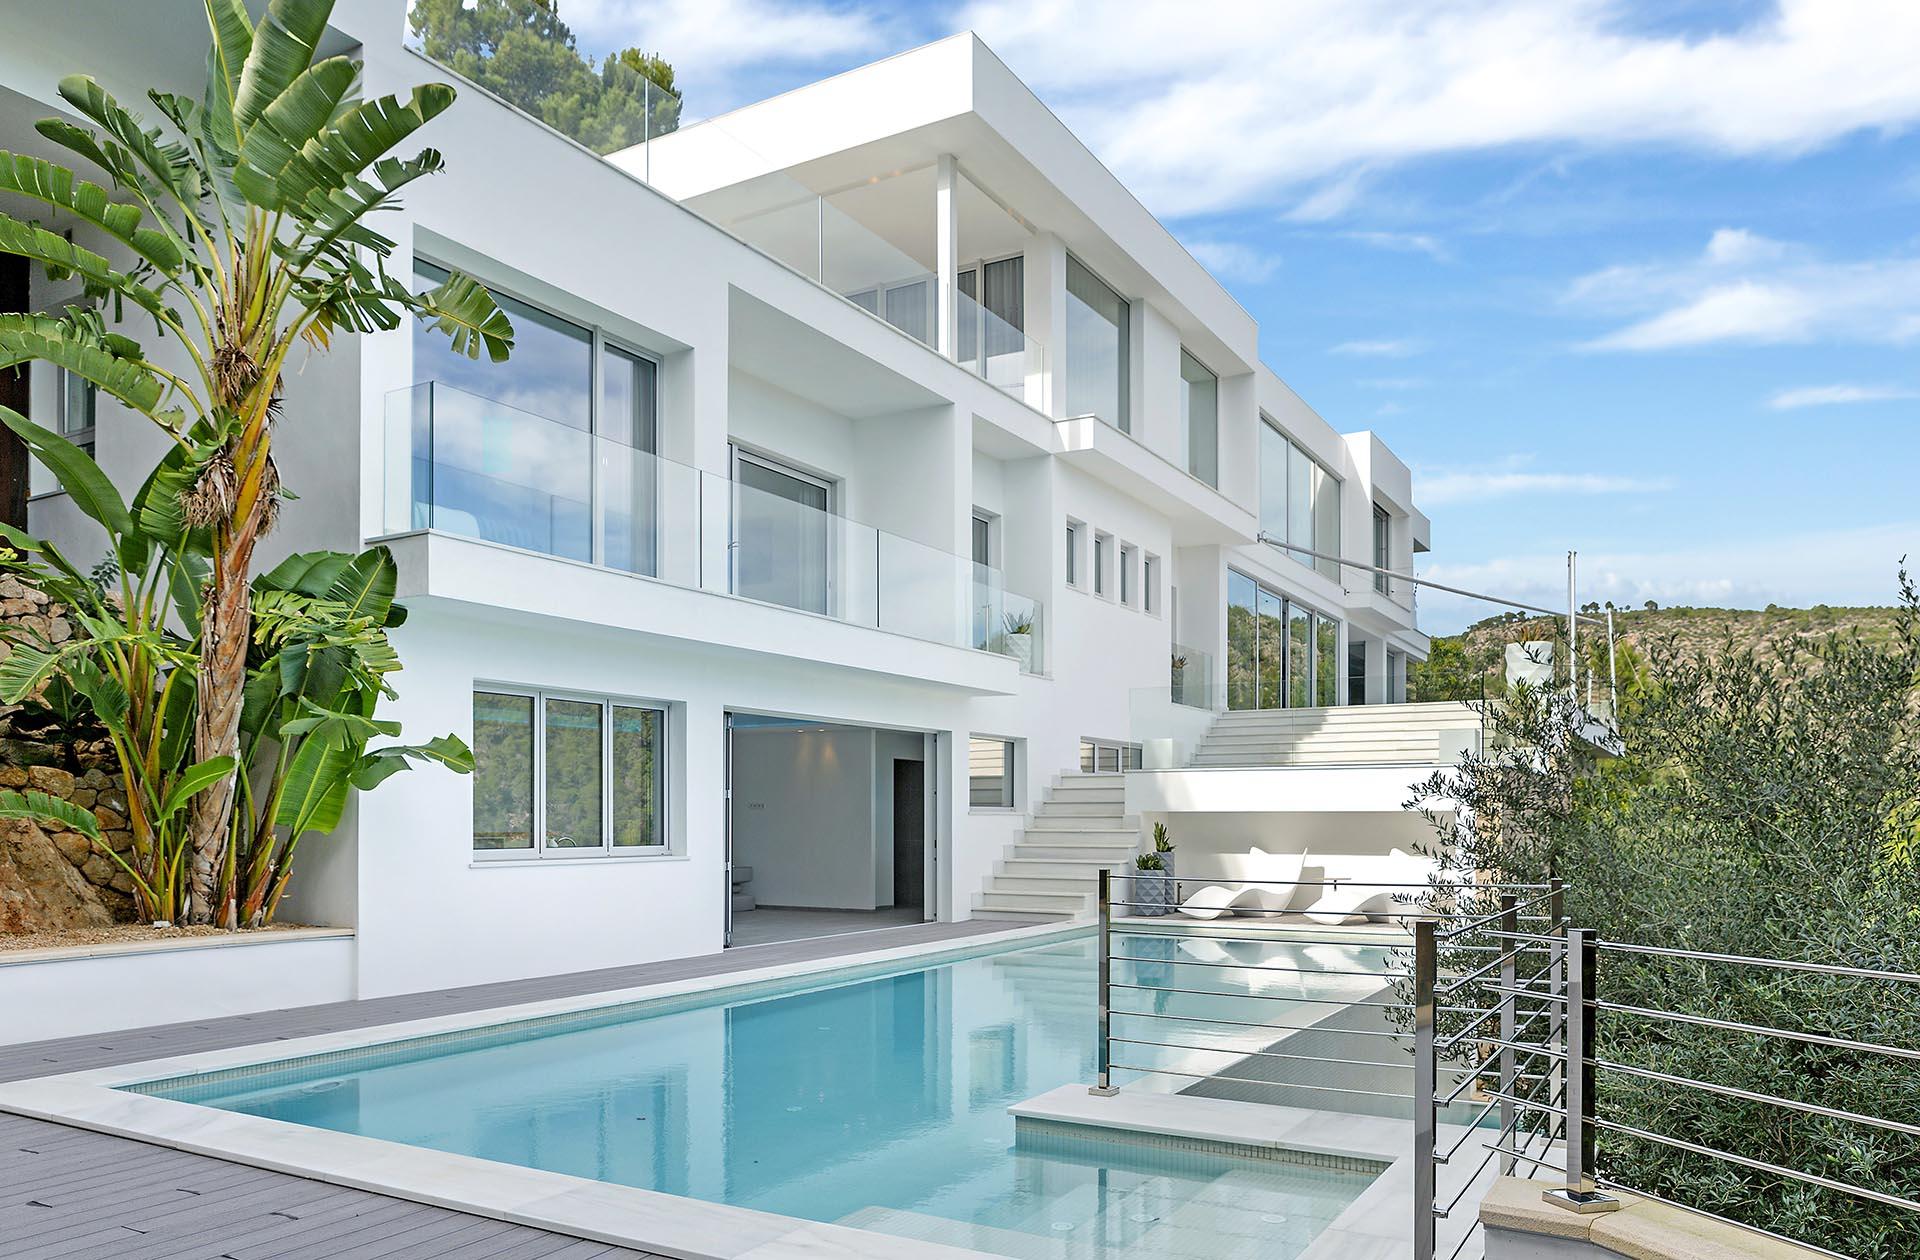 Beautiful modern villa in Costa den Blanes - Outside facade with pool